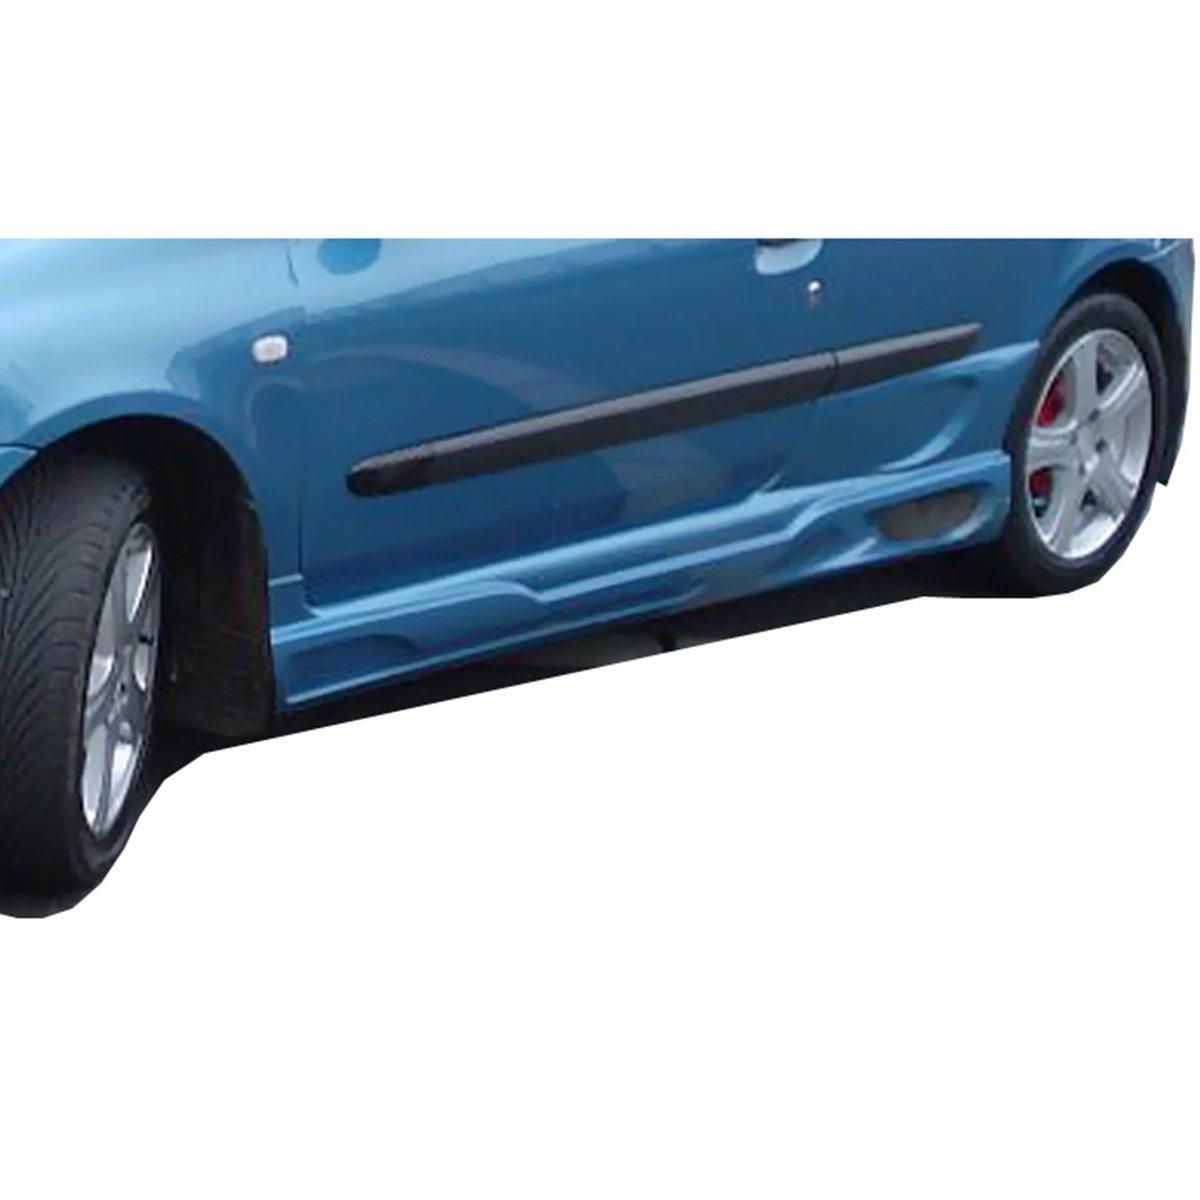 Renault-Clio-02-Venus-3-5-Portas-EBU0223